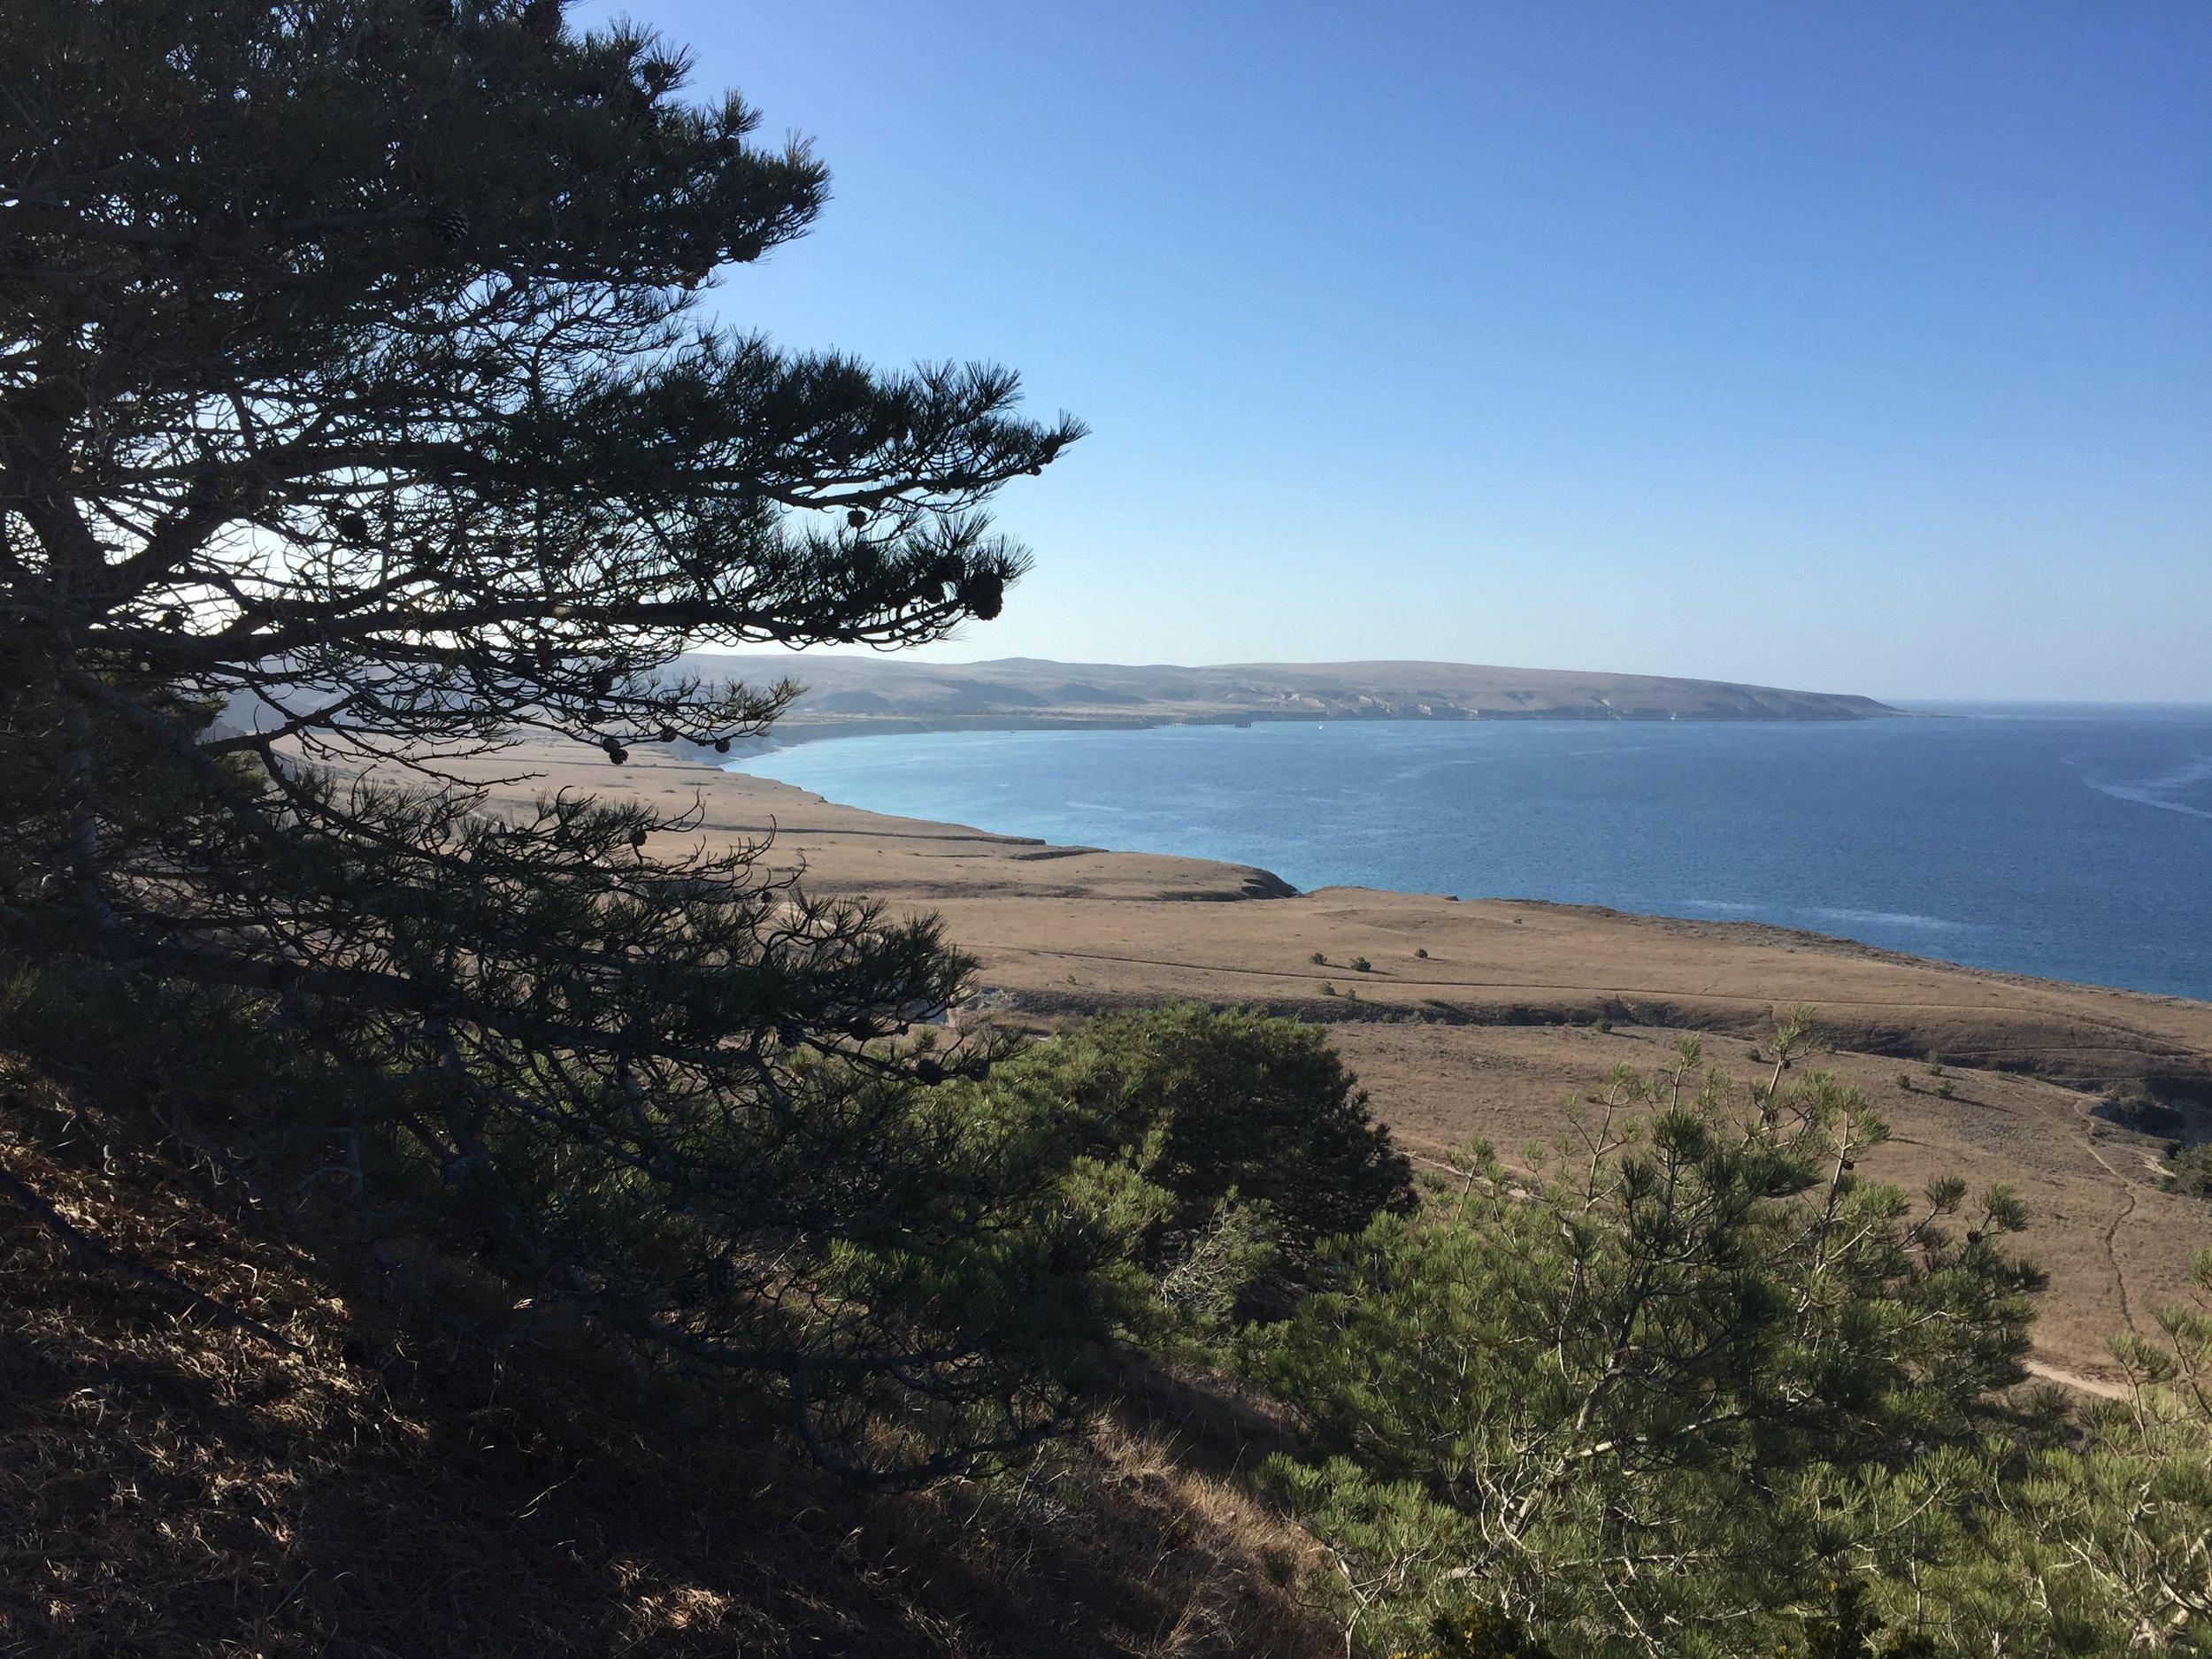 Betcher's Bay, Santa Rosa Island